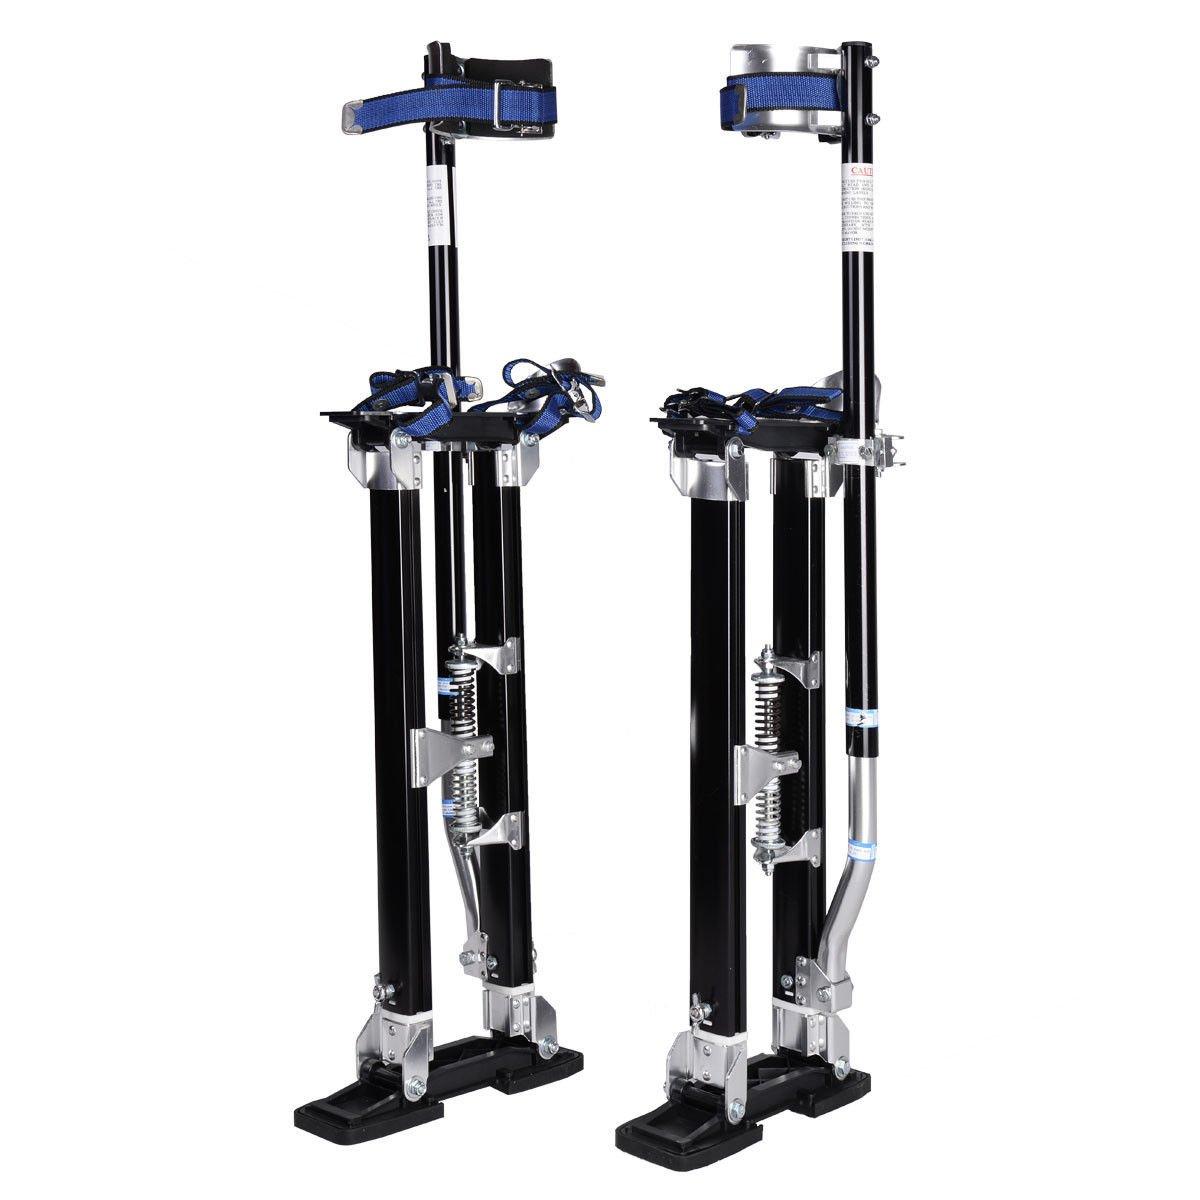 SUNCOO Drywall Stilts 24-40 Heavy duty Adjustable Height Aluminum Tool Stilt For Painting Painter Taping Black